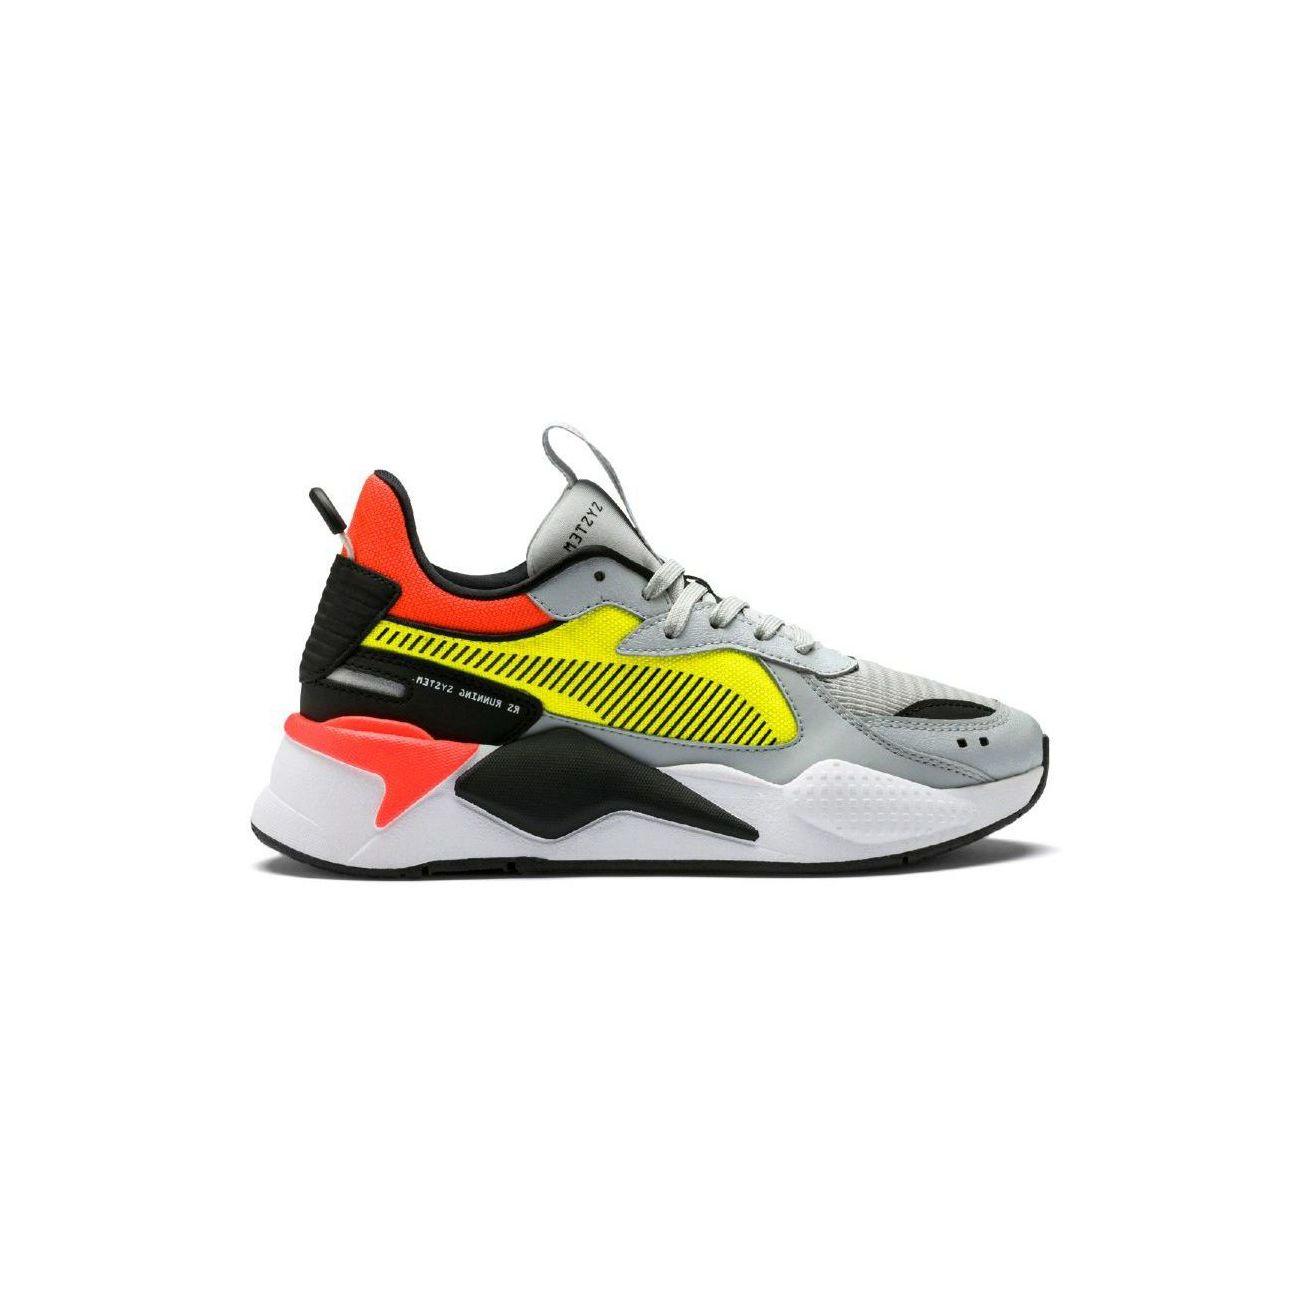 Baskets RS X HARD DRIVE – achat pas cher GO Sport